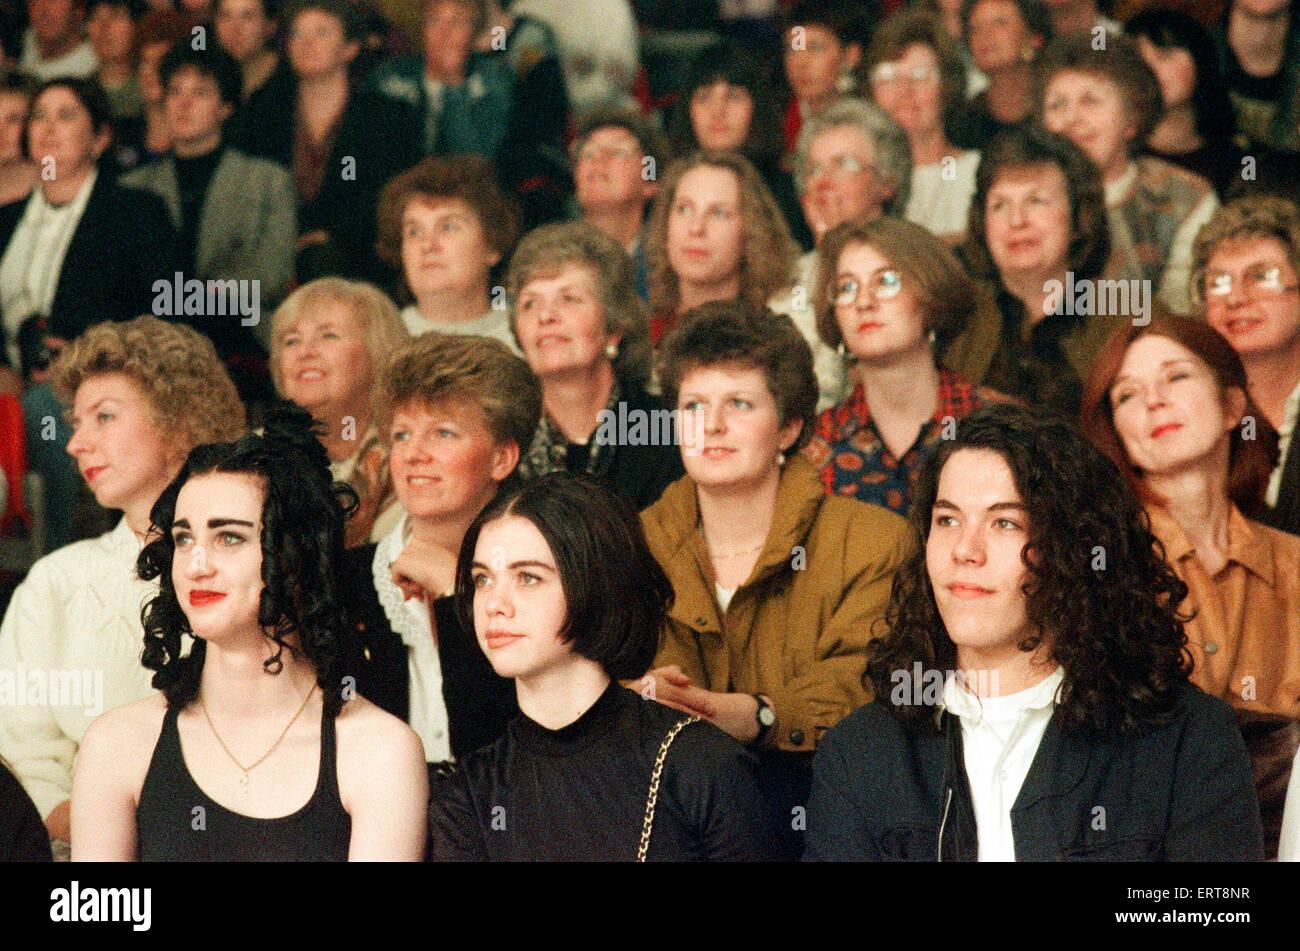 Kleidung Show Live, Zuschauer, Birmingham NEC, 6. Dezember 1990. Stockbild